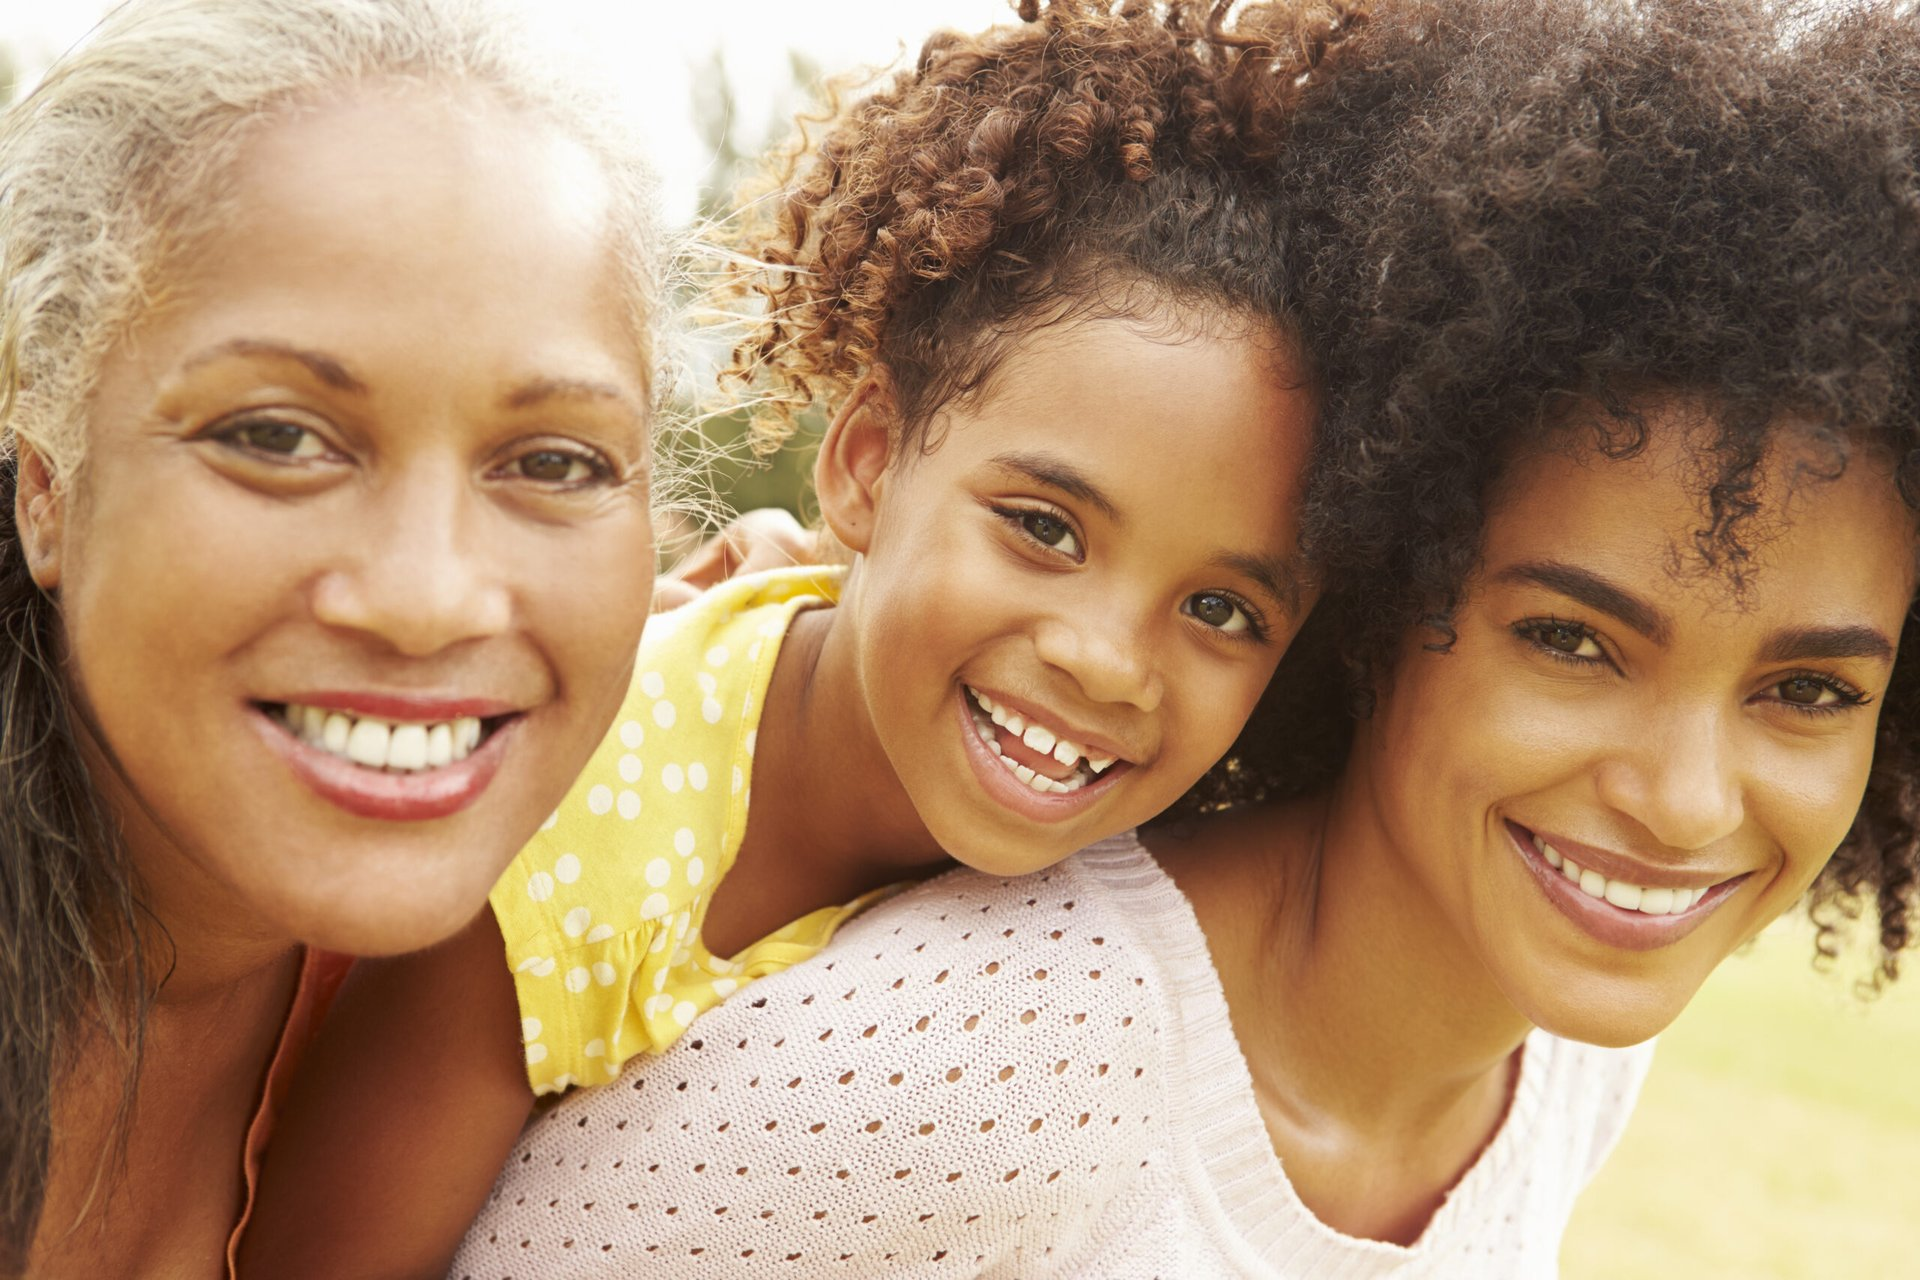 Portrait of three generations of females